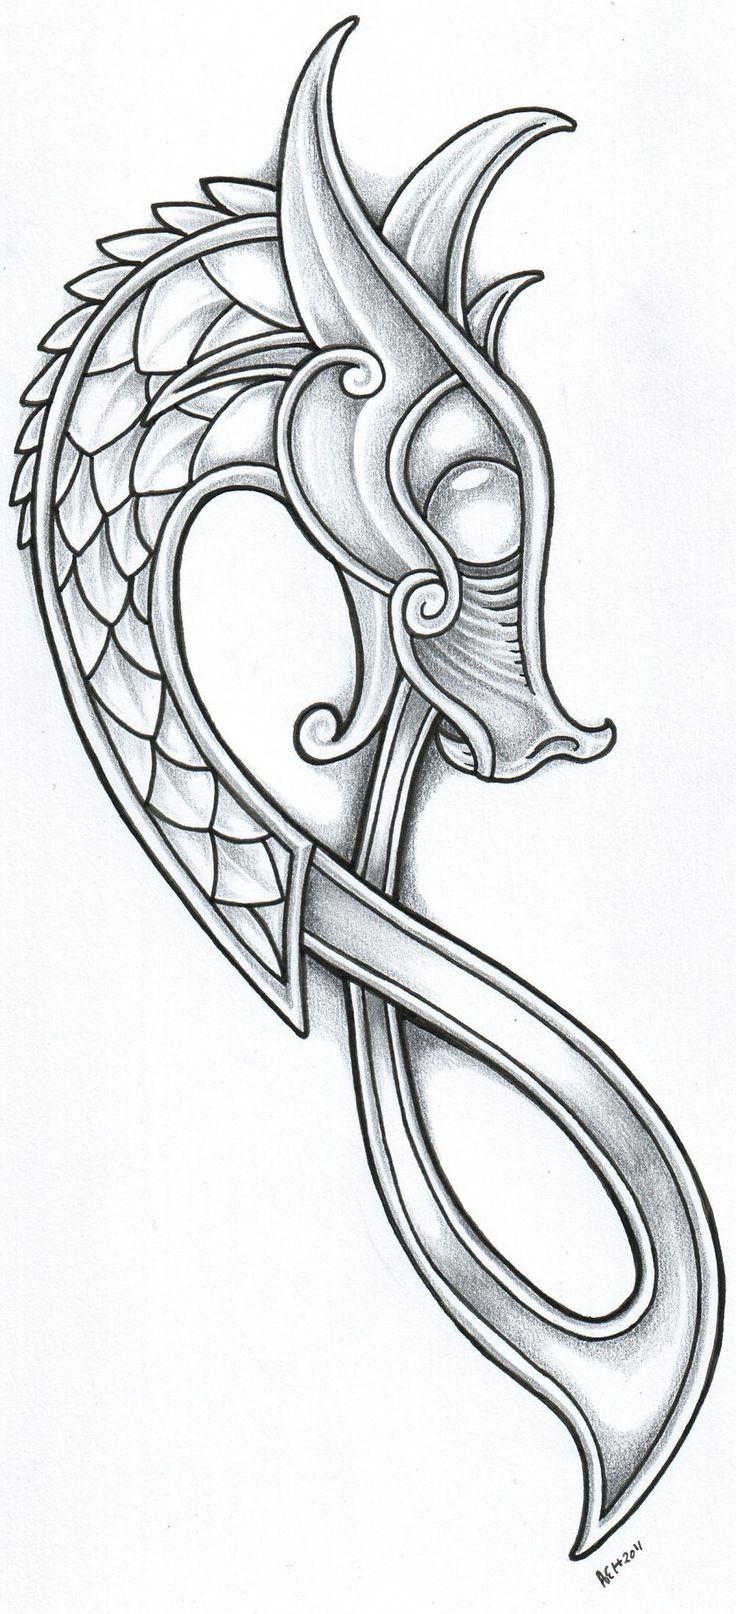 http://fc01.deviantart.net/fs70/i/2011/033/1/3/viking_dragon_2011_by_vikingtattoo-d38nprv.jpg